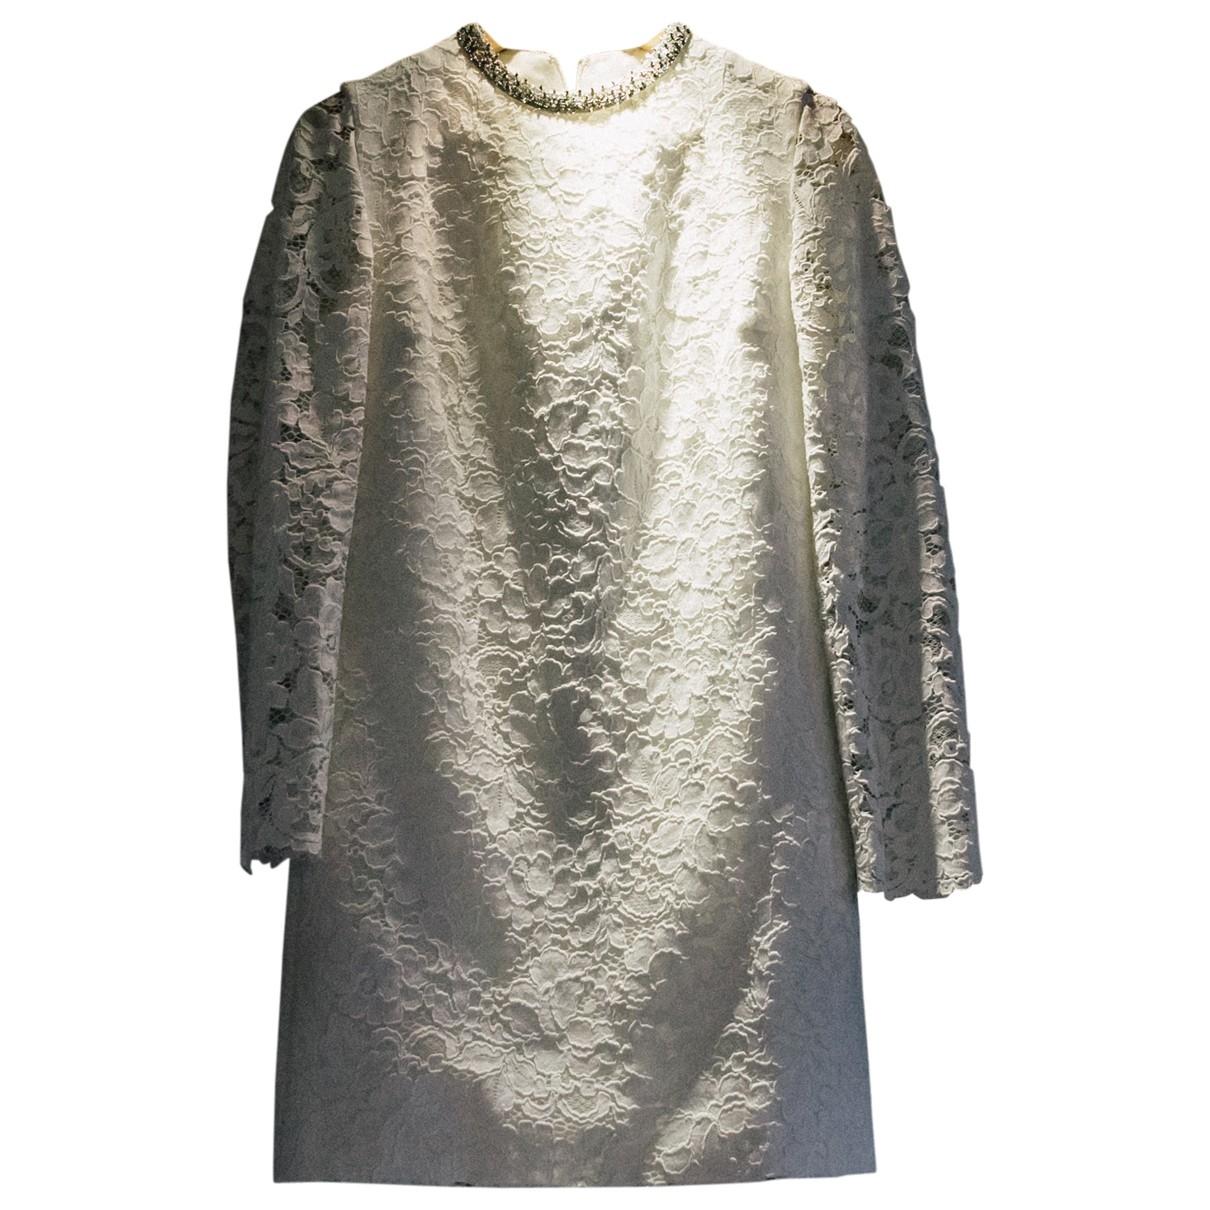 Saint Laurent \N White Lace dress for Women 38 FR